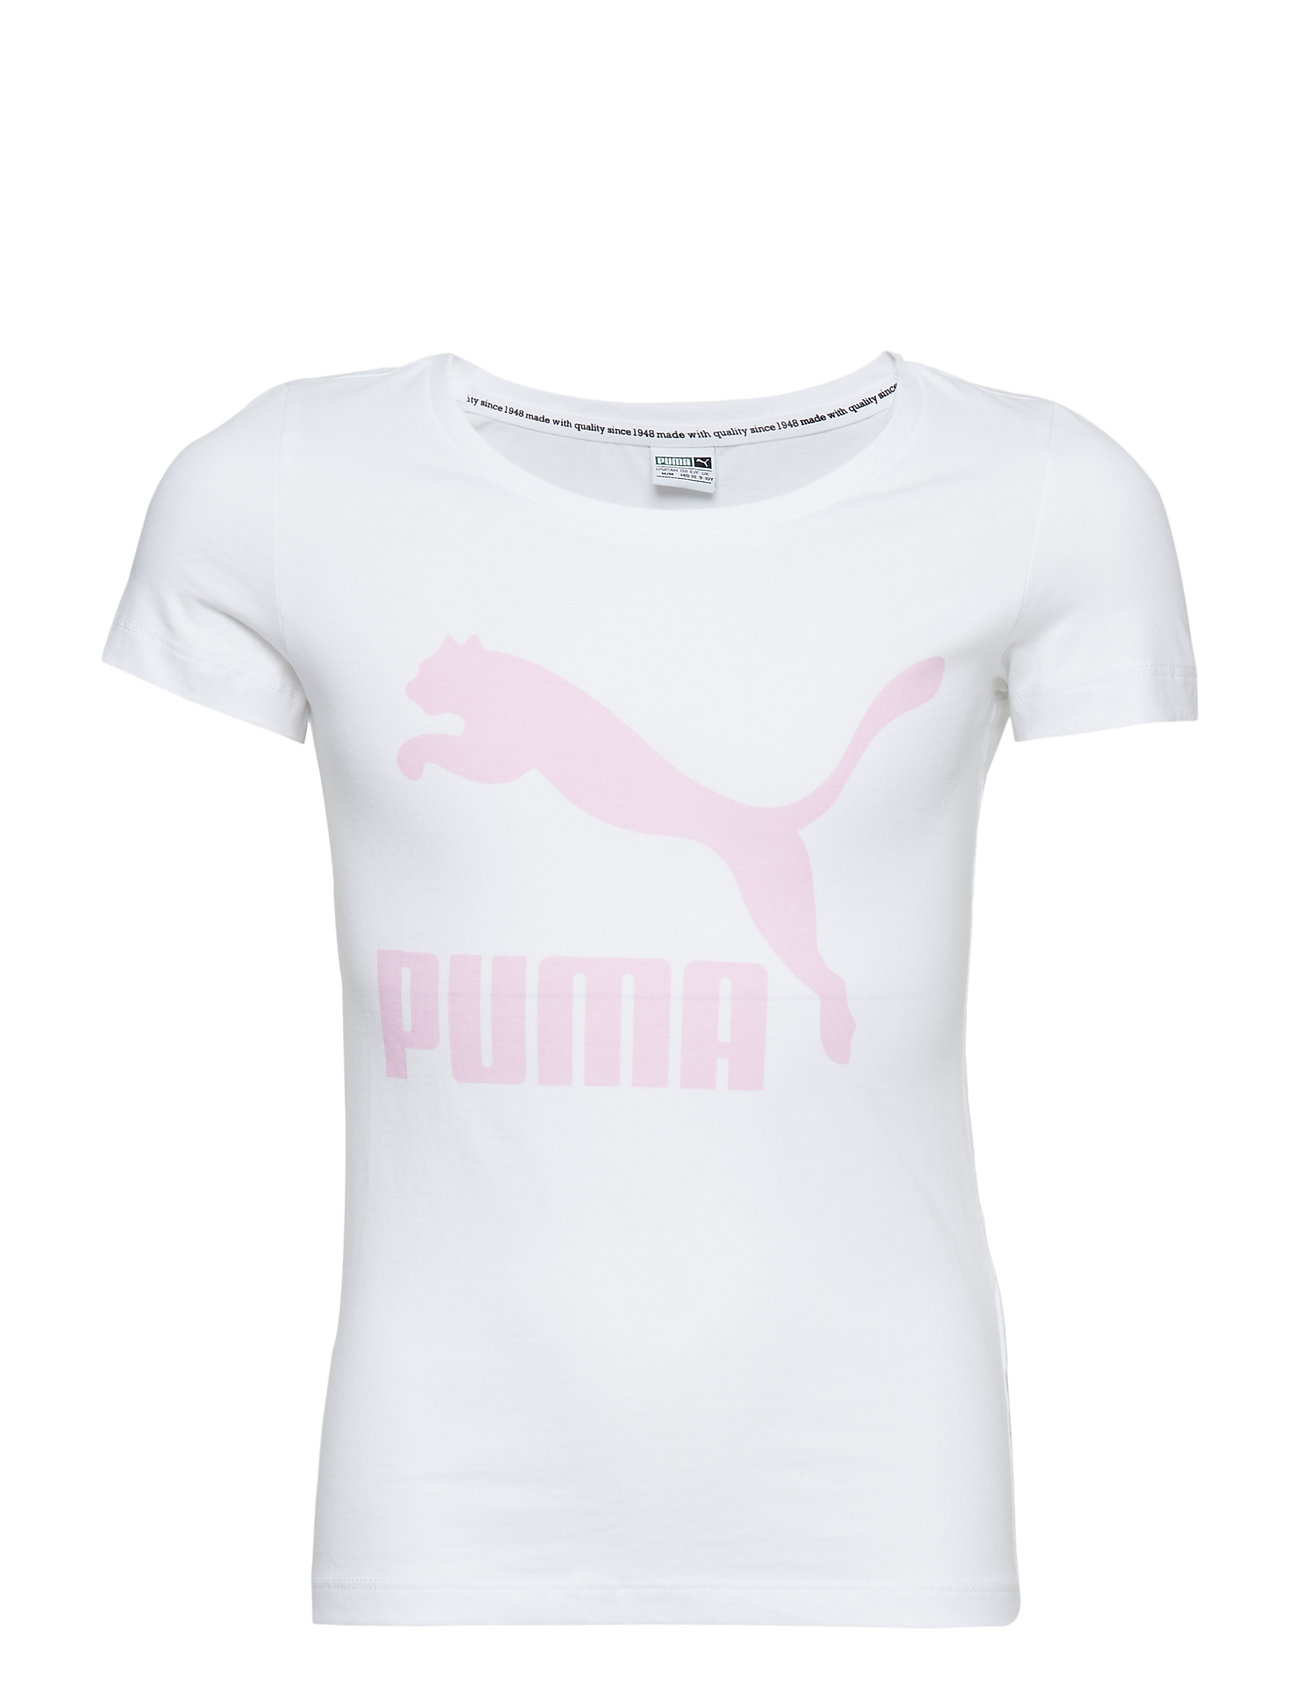 b6778671 Classics Logo Tee G (Puma White-pale Pink) (130 kr) - PUMA - | Boozt.com